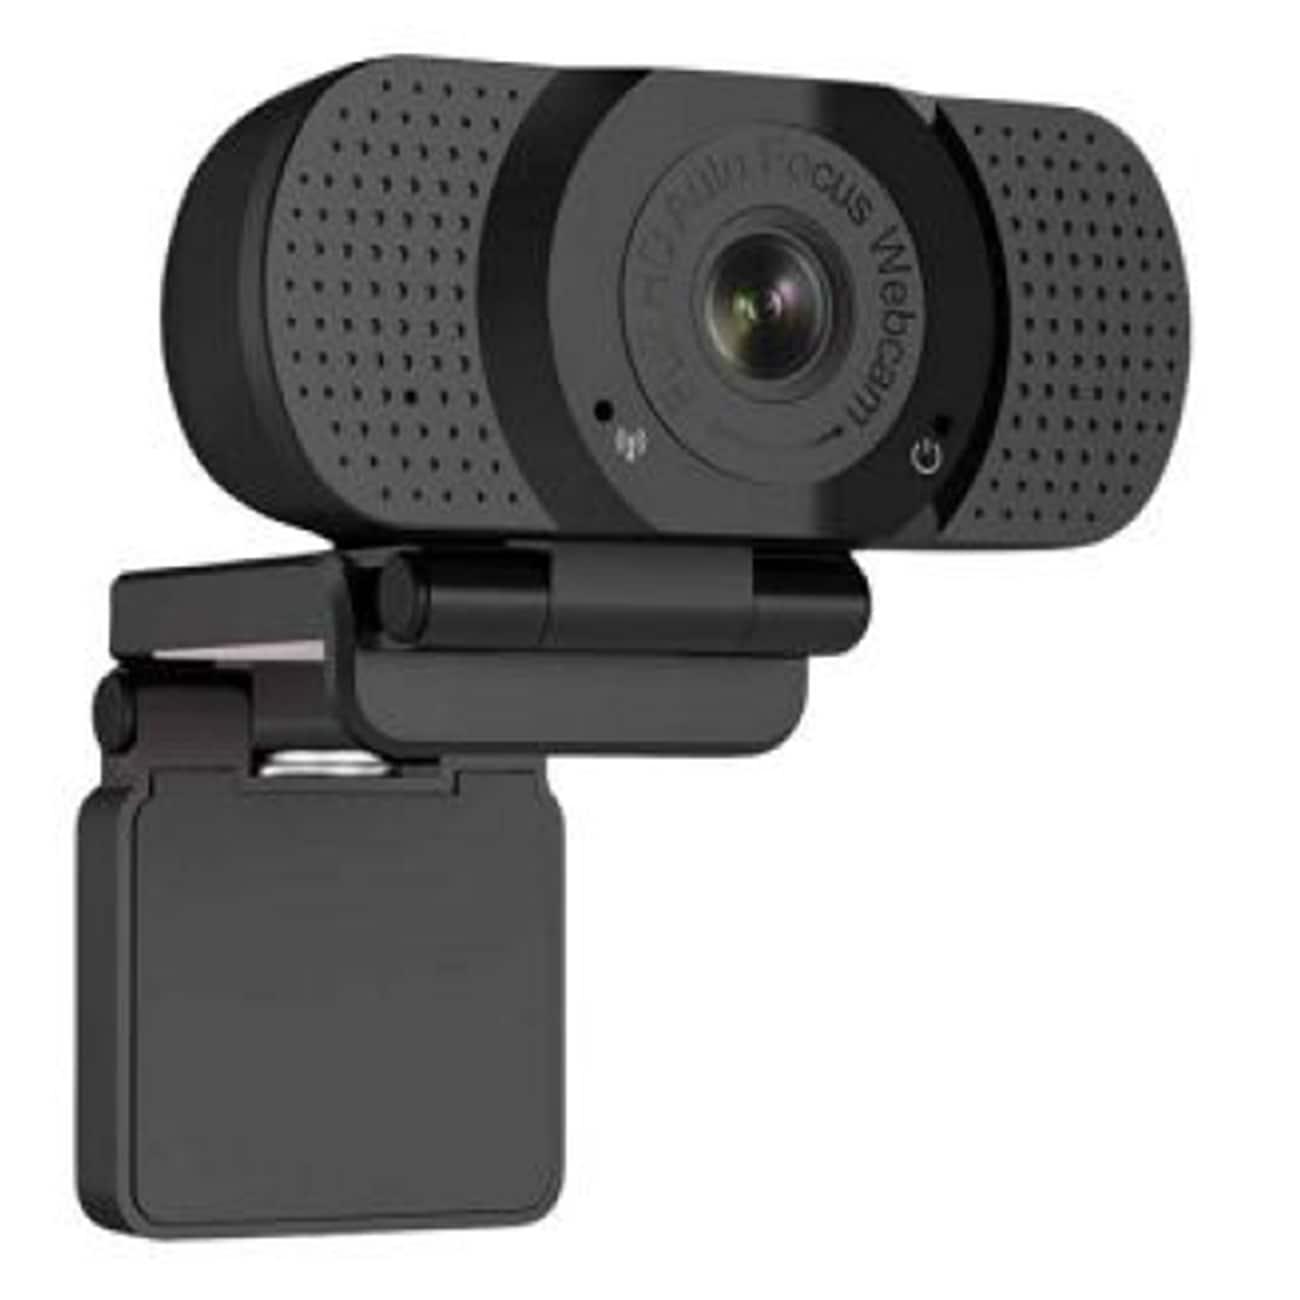 Gaming WebCam For Streaming USB FHD Microphone Camera Auto Focus SP-WCAM11 - 5